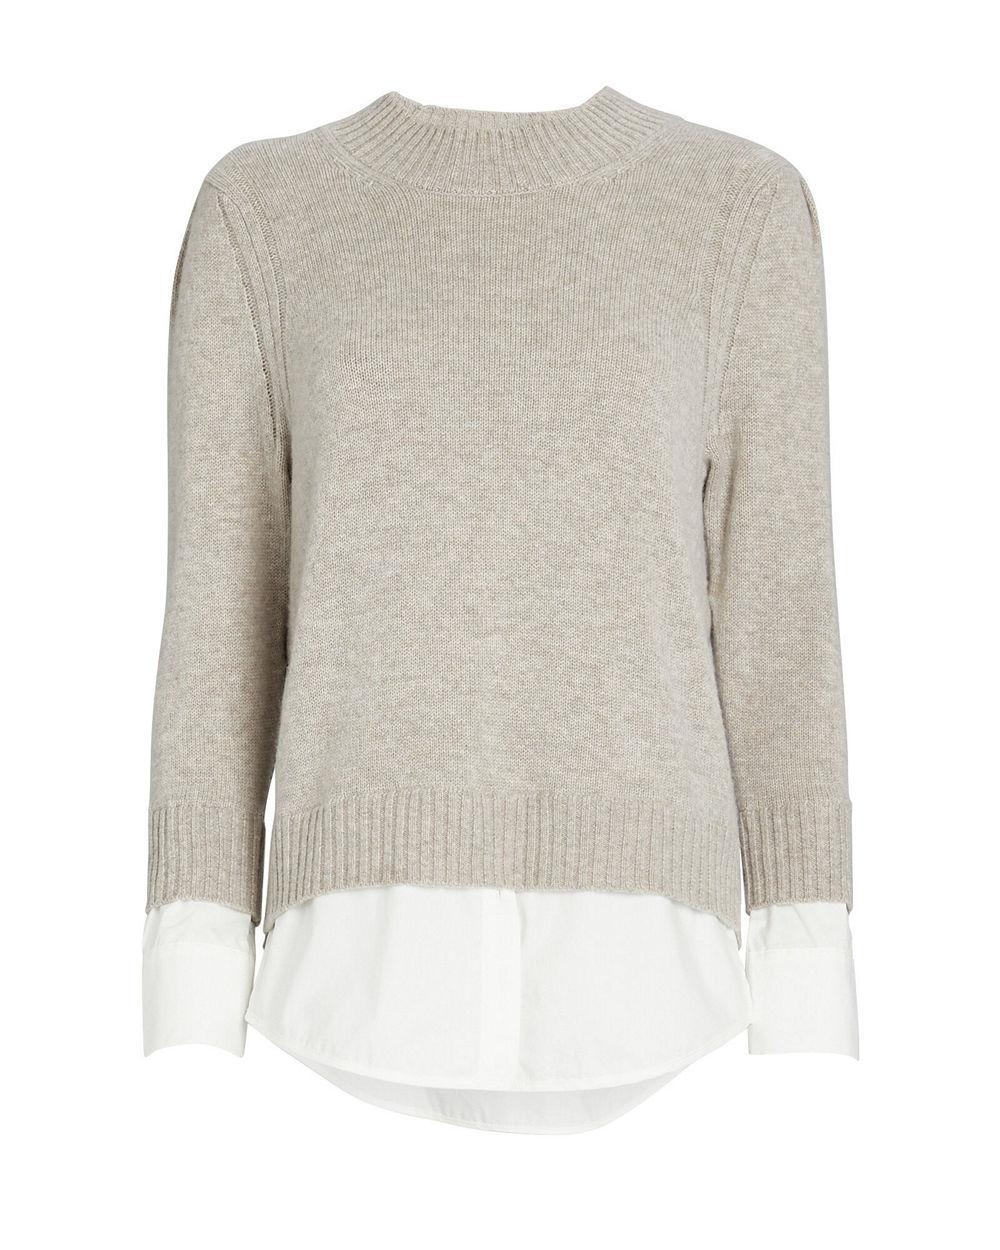 Eton Layered Crewneck Looker Sweater